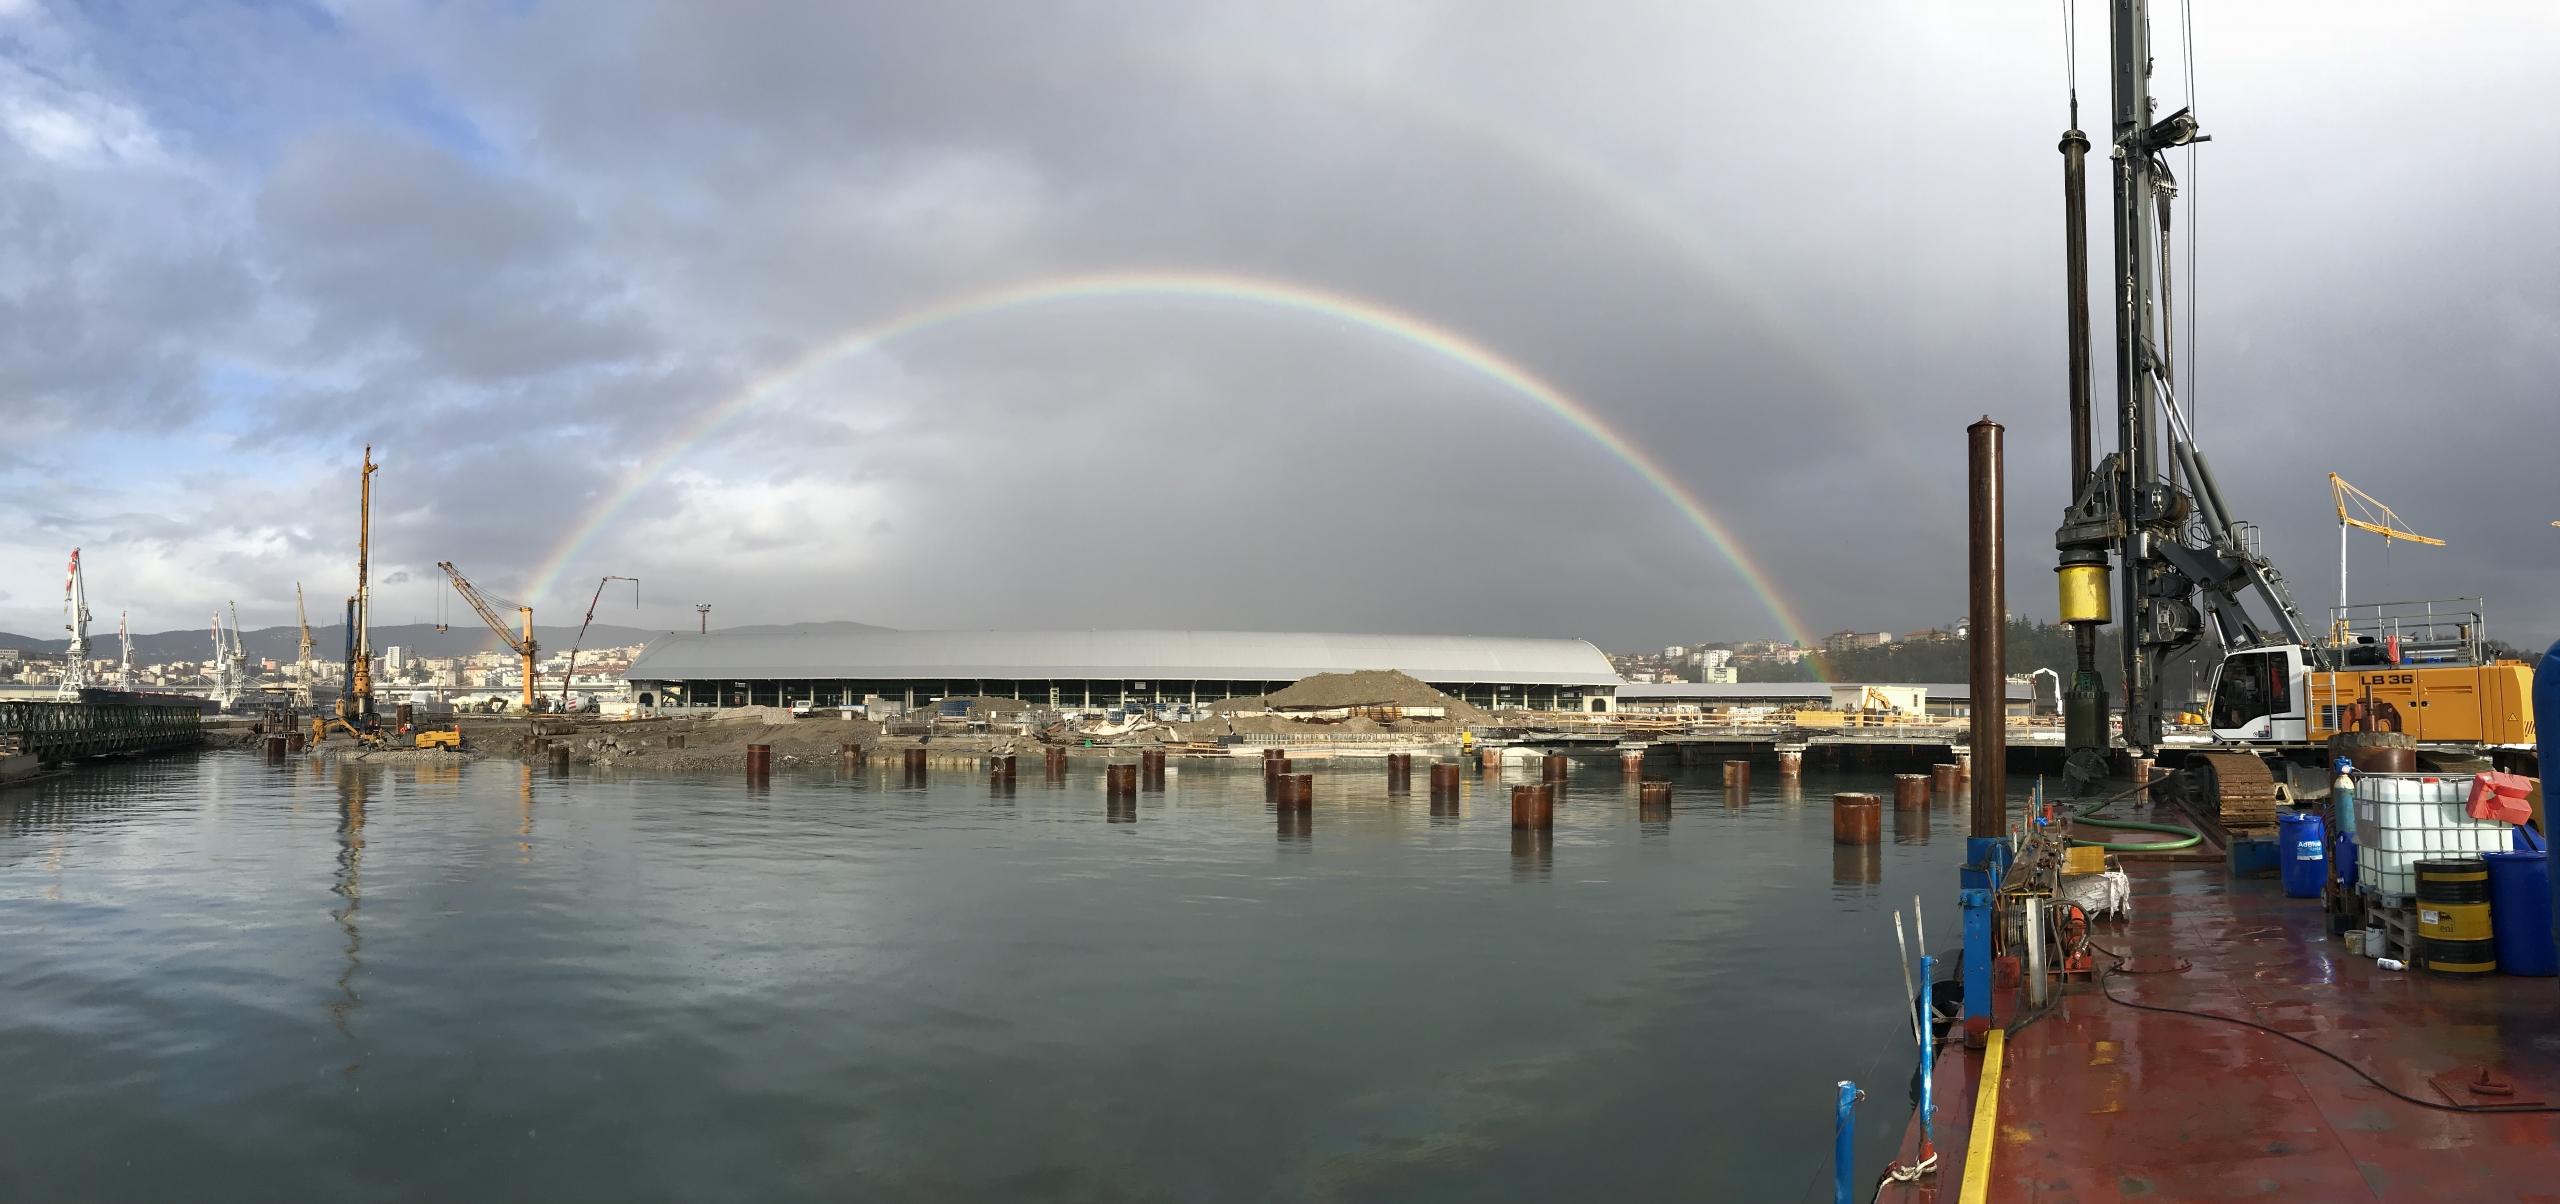 arcobaleno 2